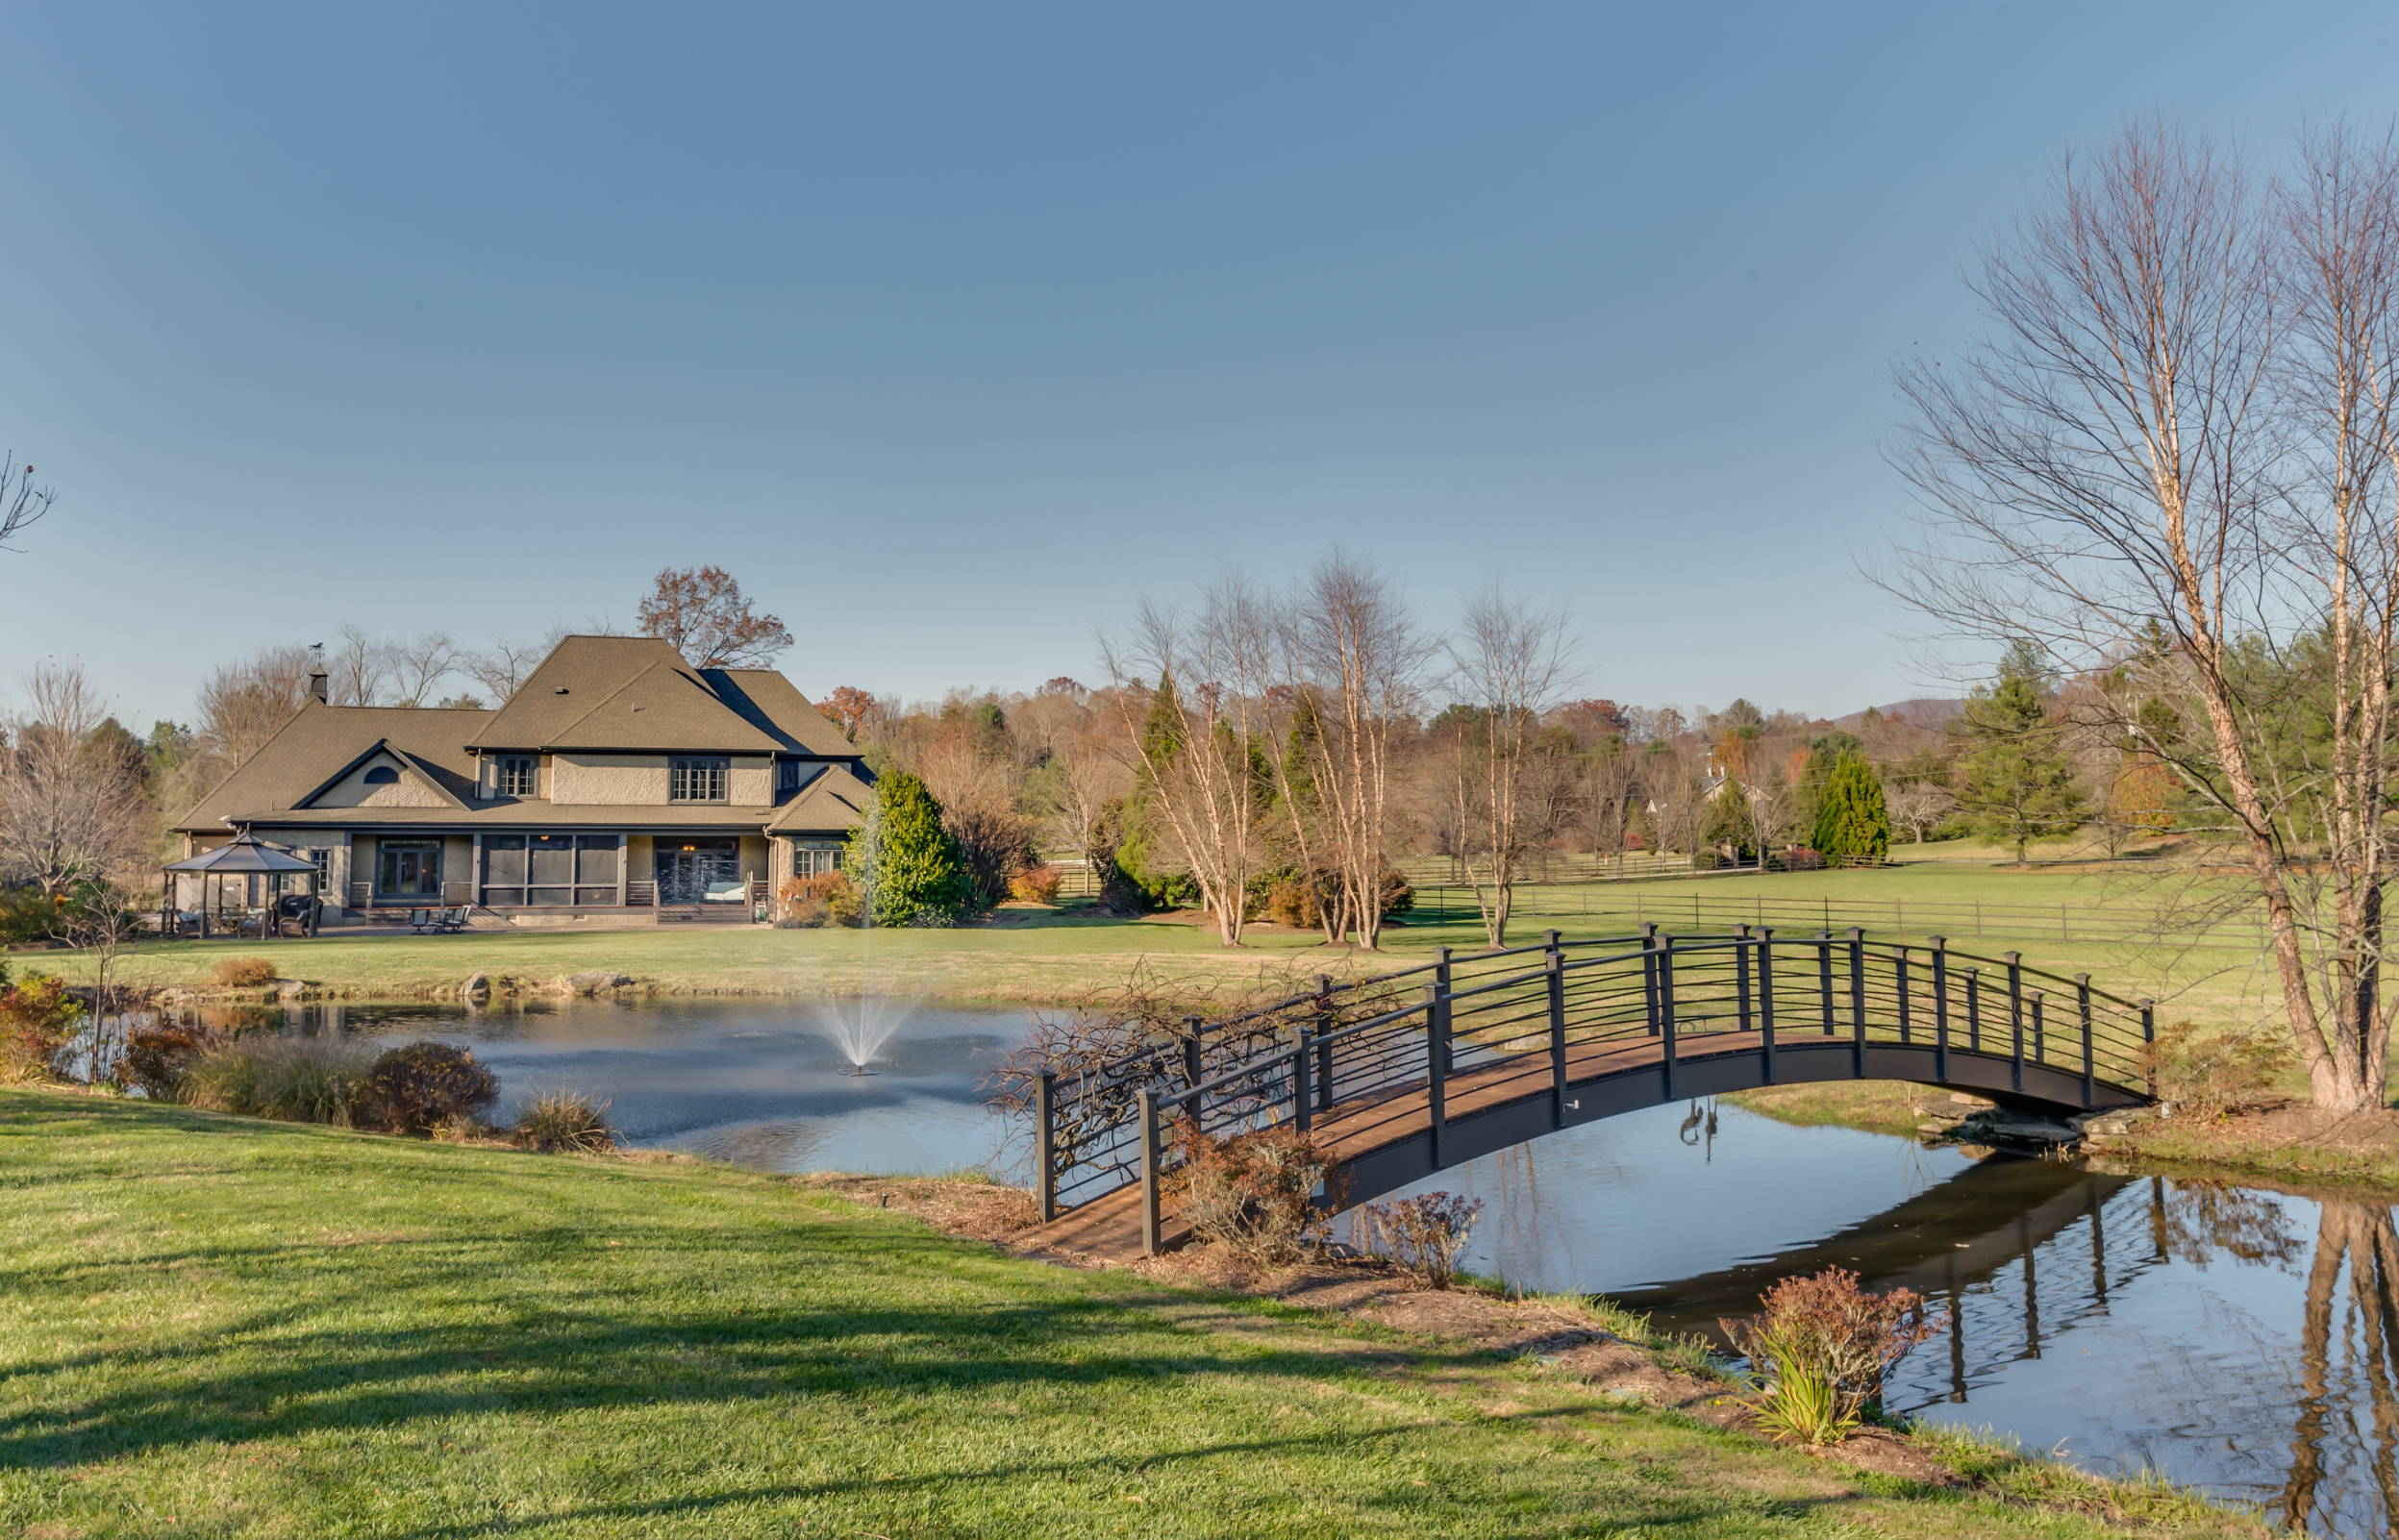 415-Brush-Creek-Rd-Fairview-NC-28730-44.jpg